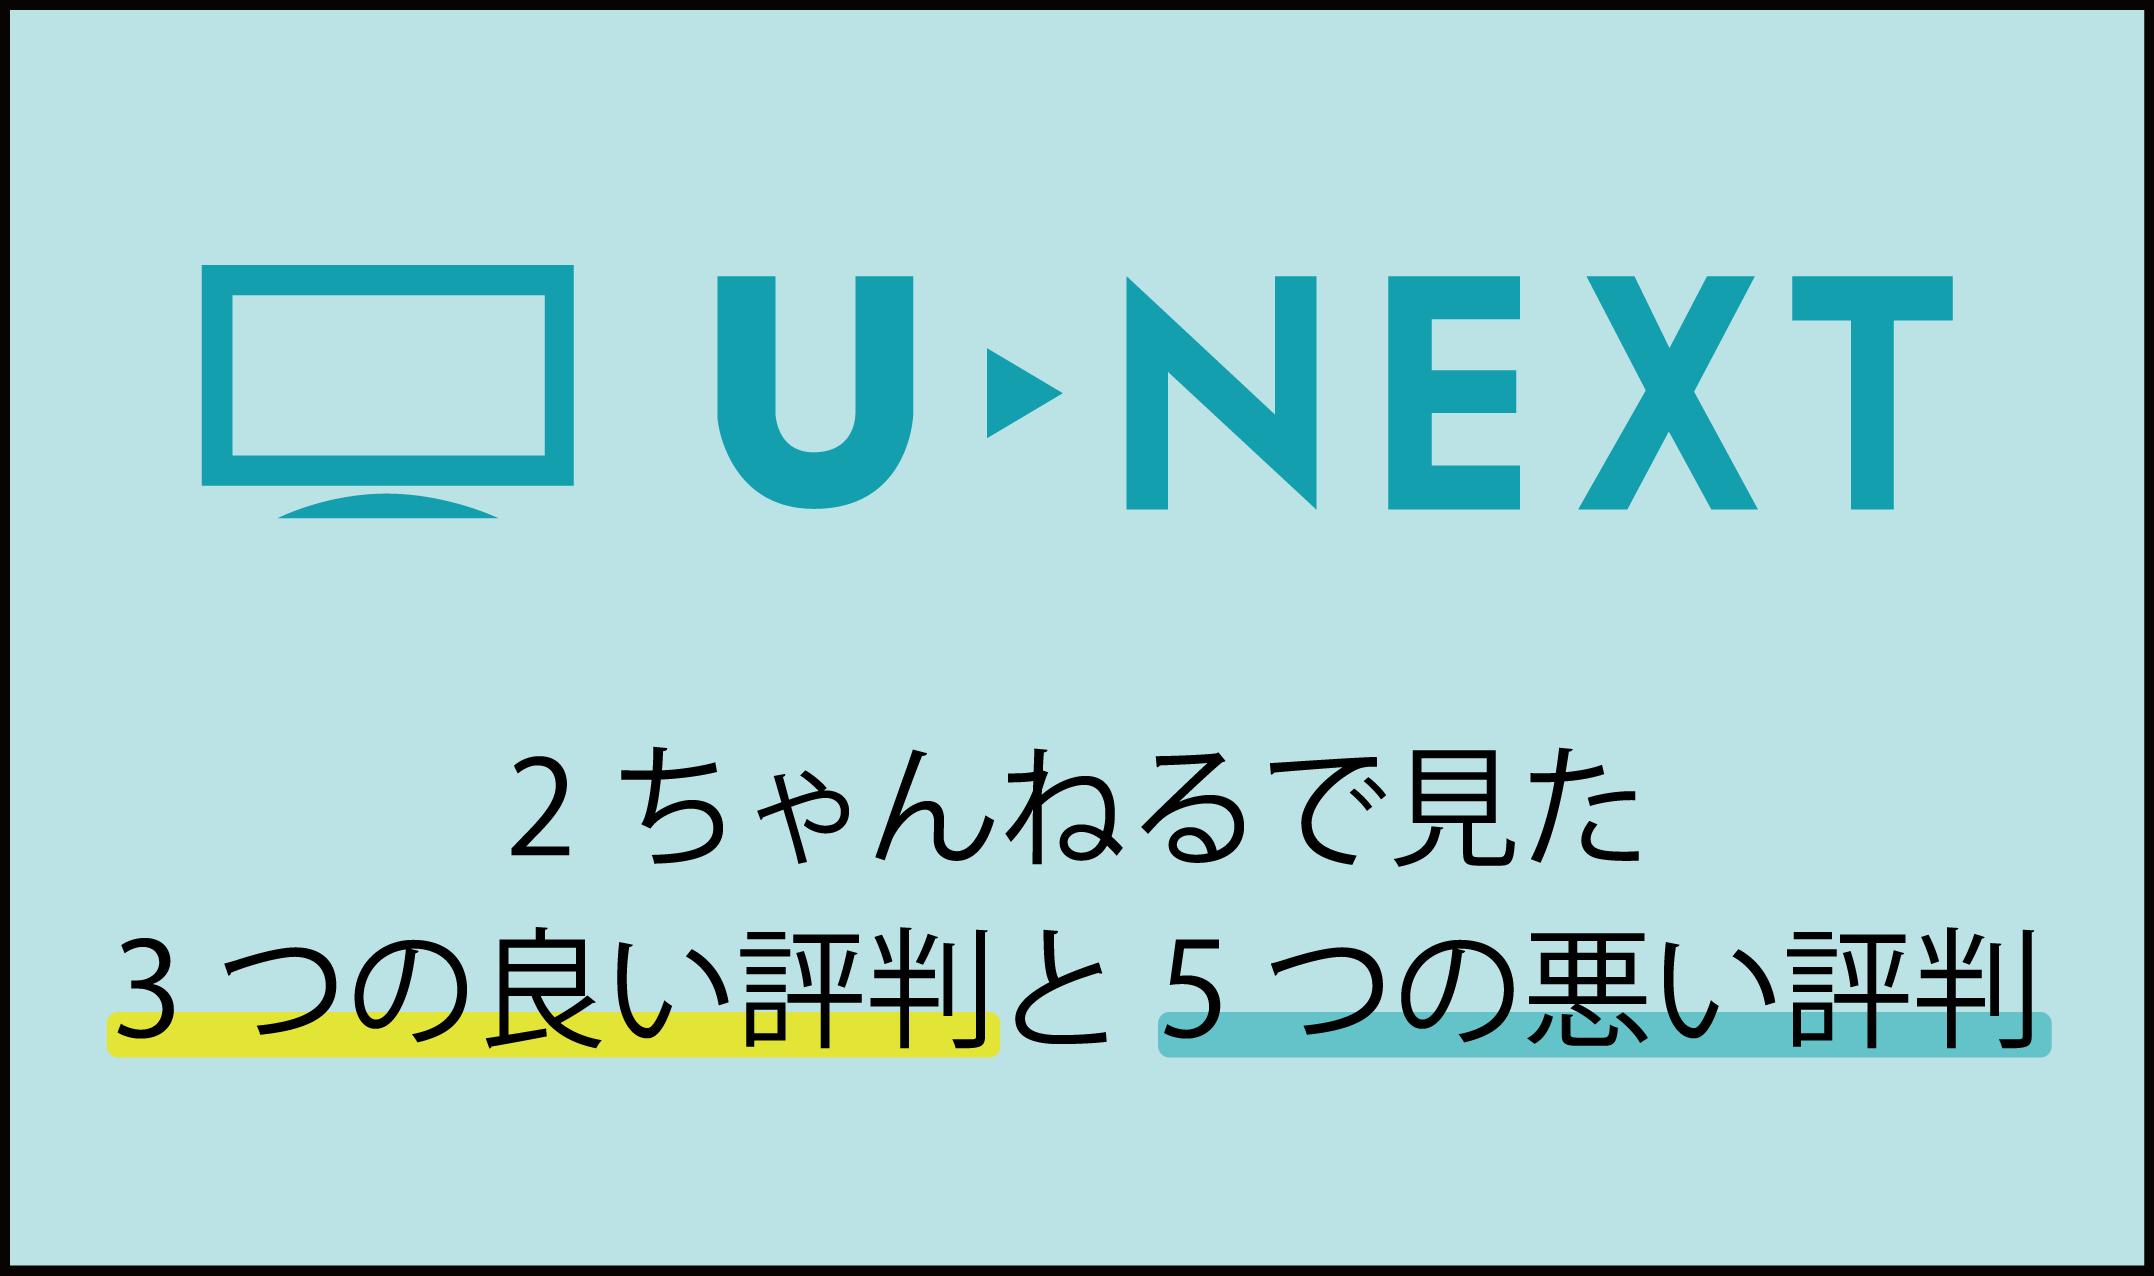 U-NEXTの評判を2chで確認!サービス内容に関する解説あり